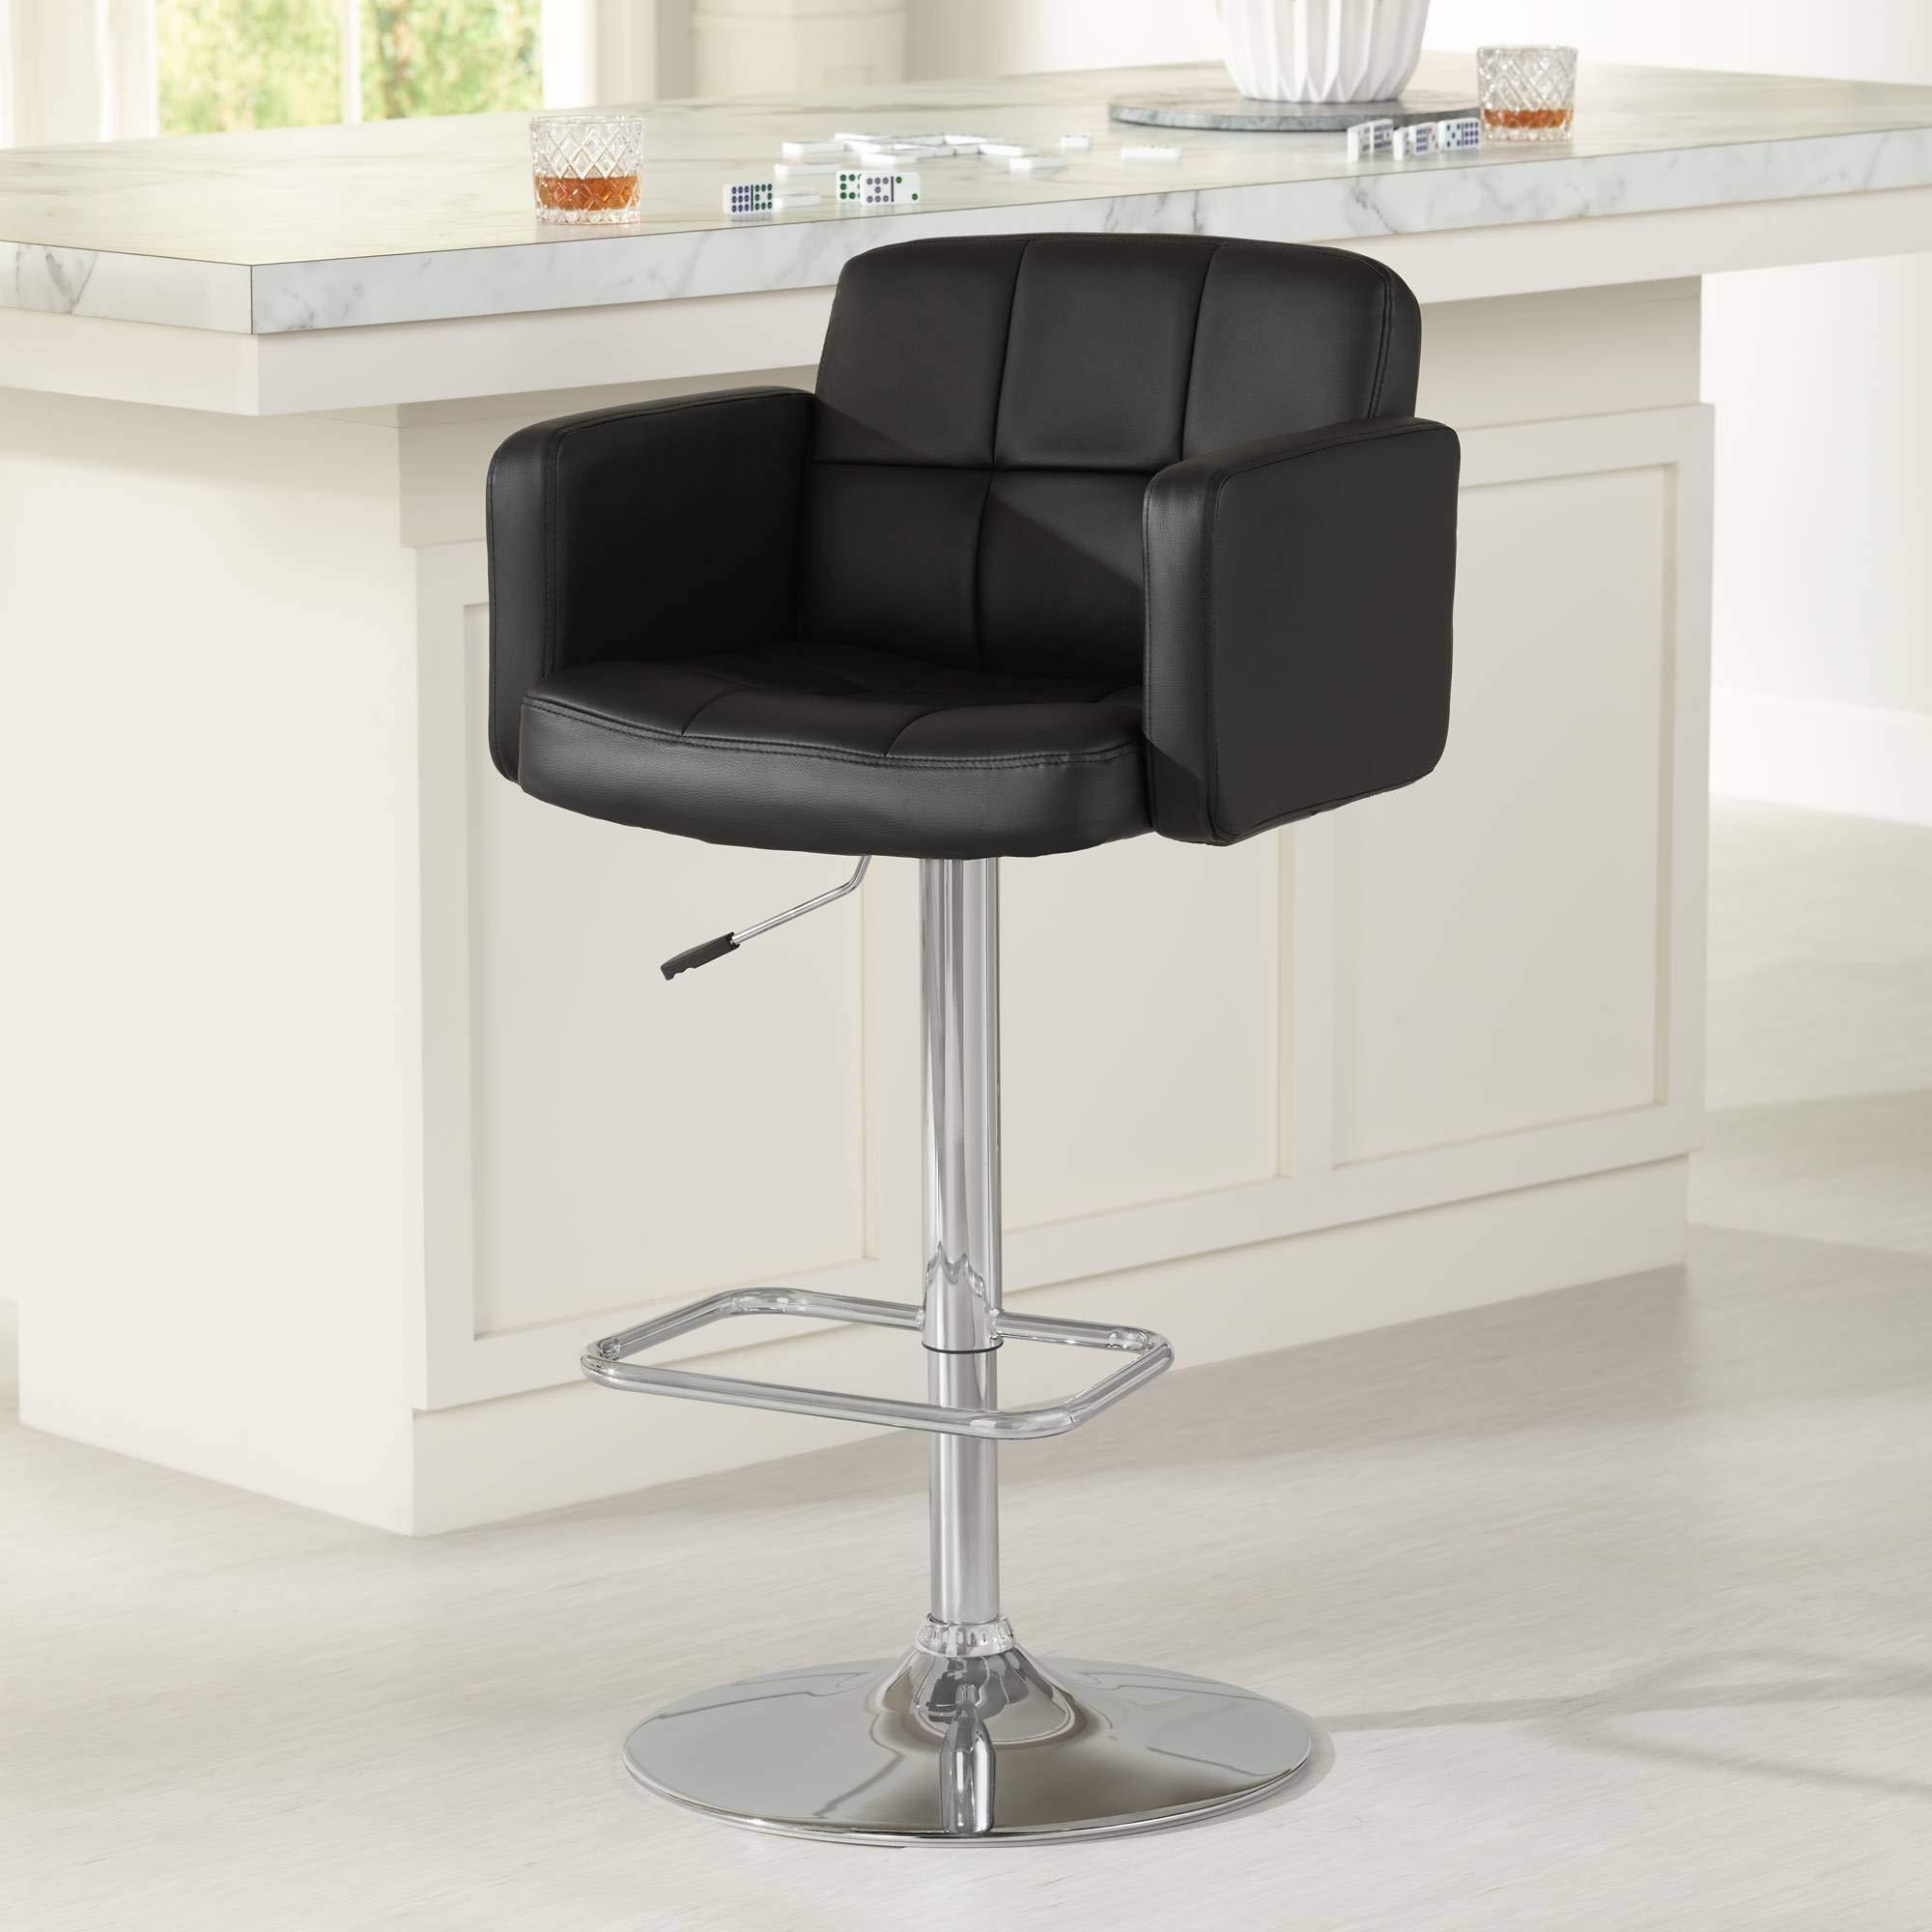 Trek Large Black Faux Leather Adjustable Swivel Bar Stool - Studio 55D by Studio 55D